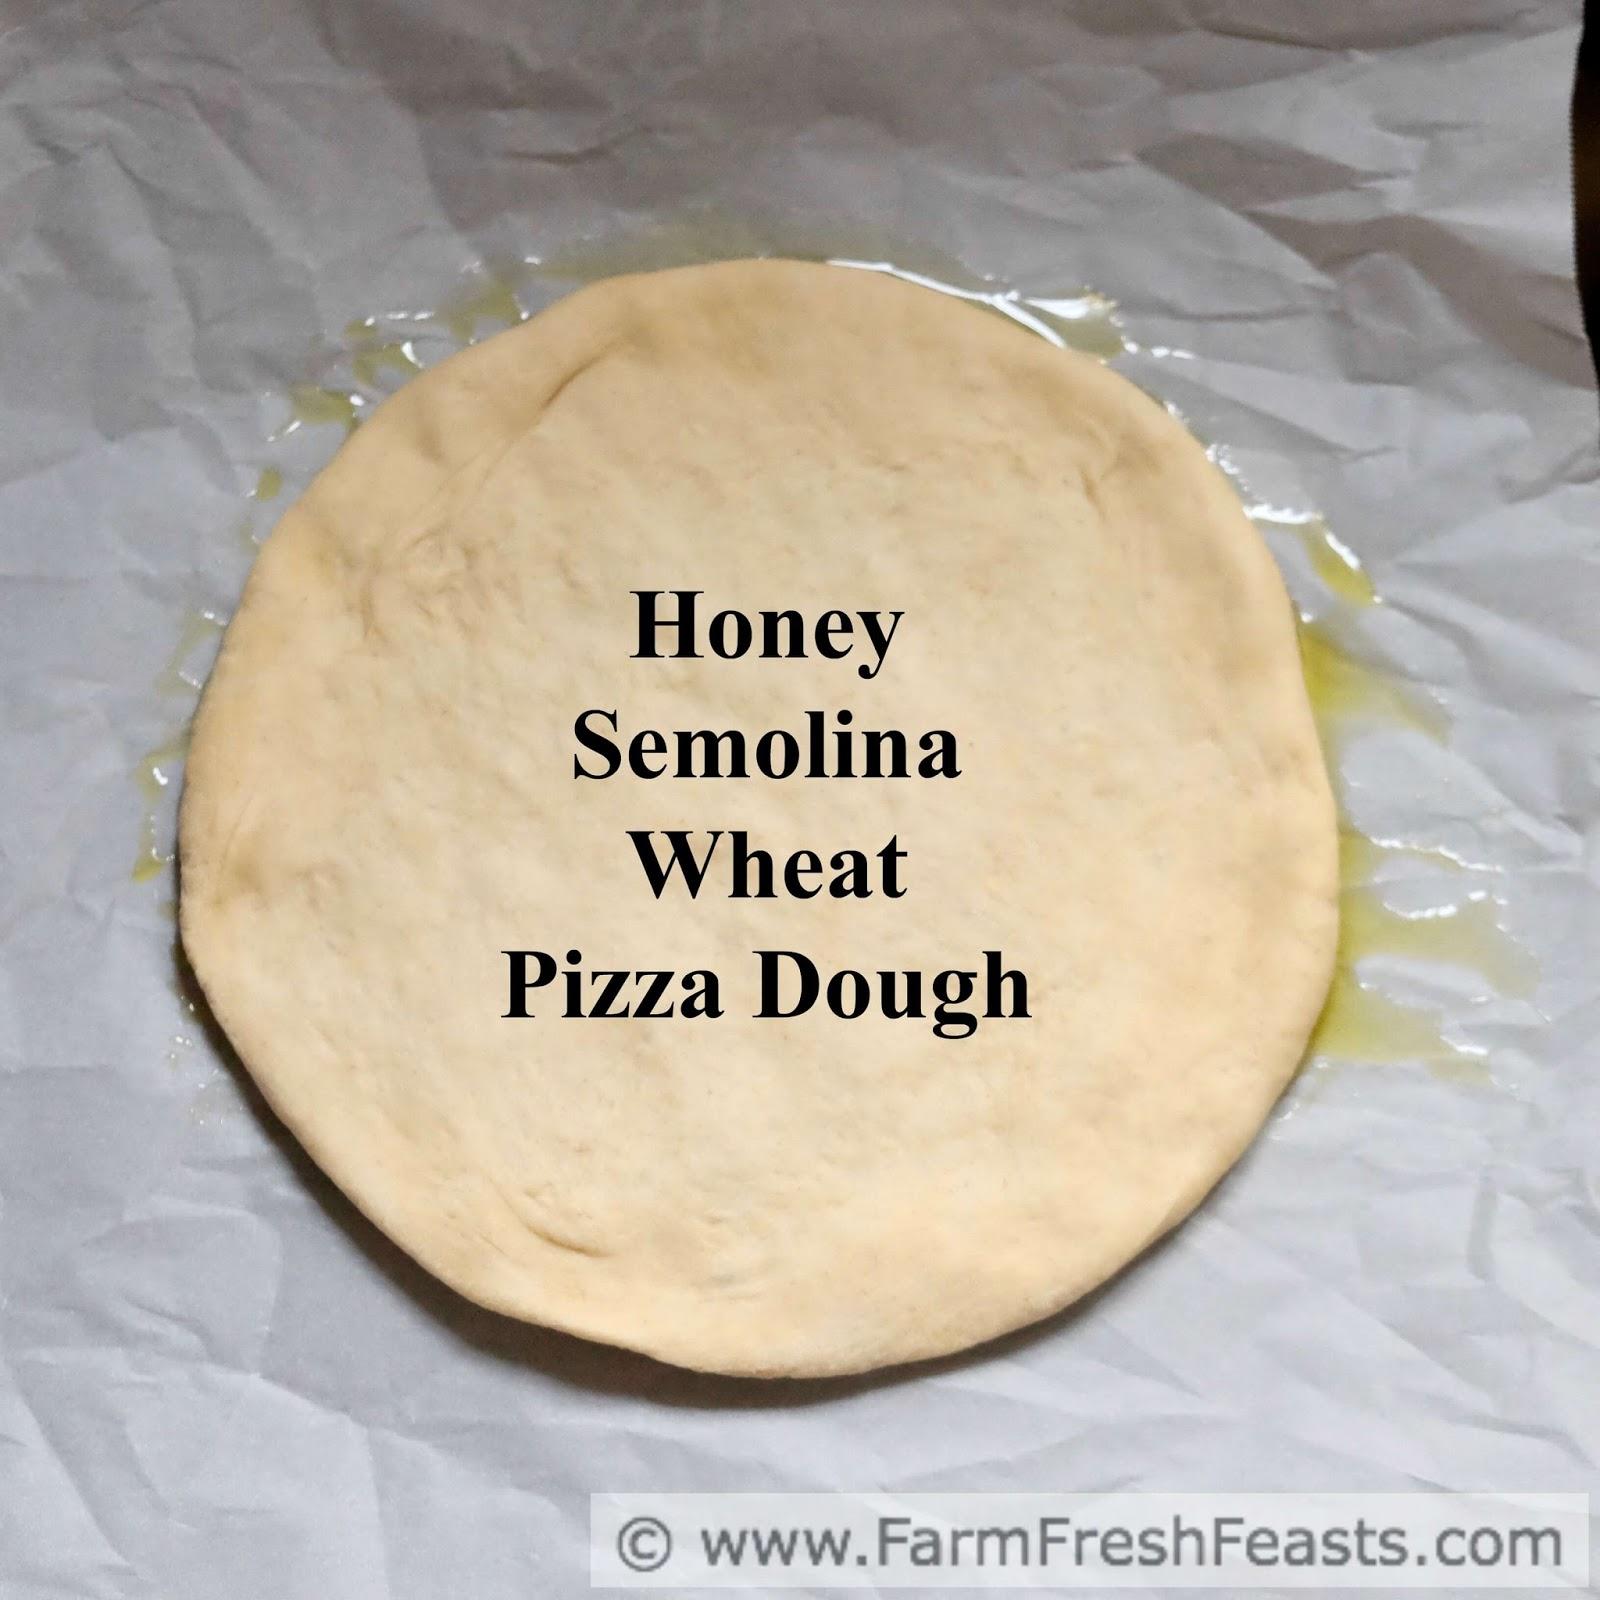 Honey Semolina Wheat Pizza Dough http://www.farmfreshfeasts.com/2017 ...